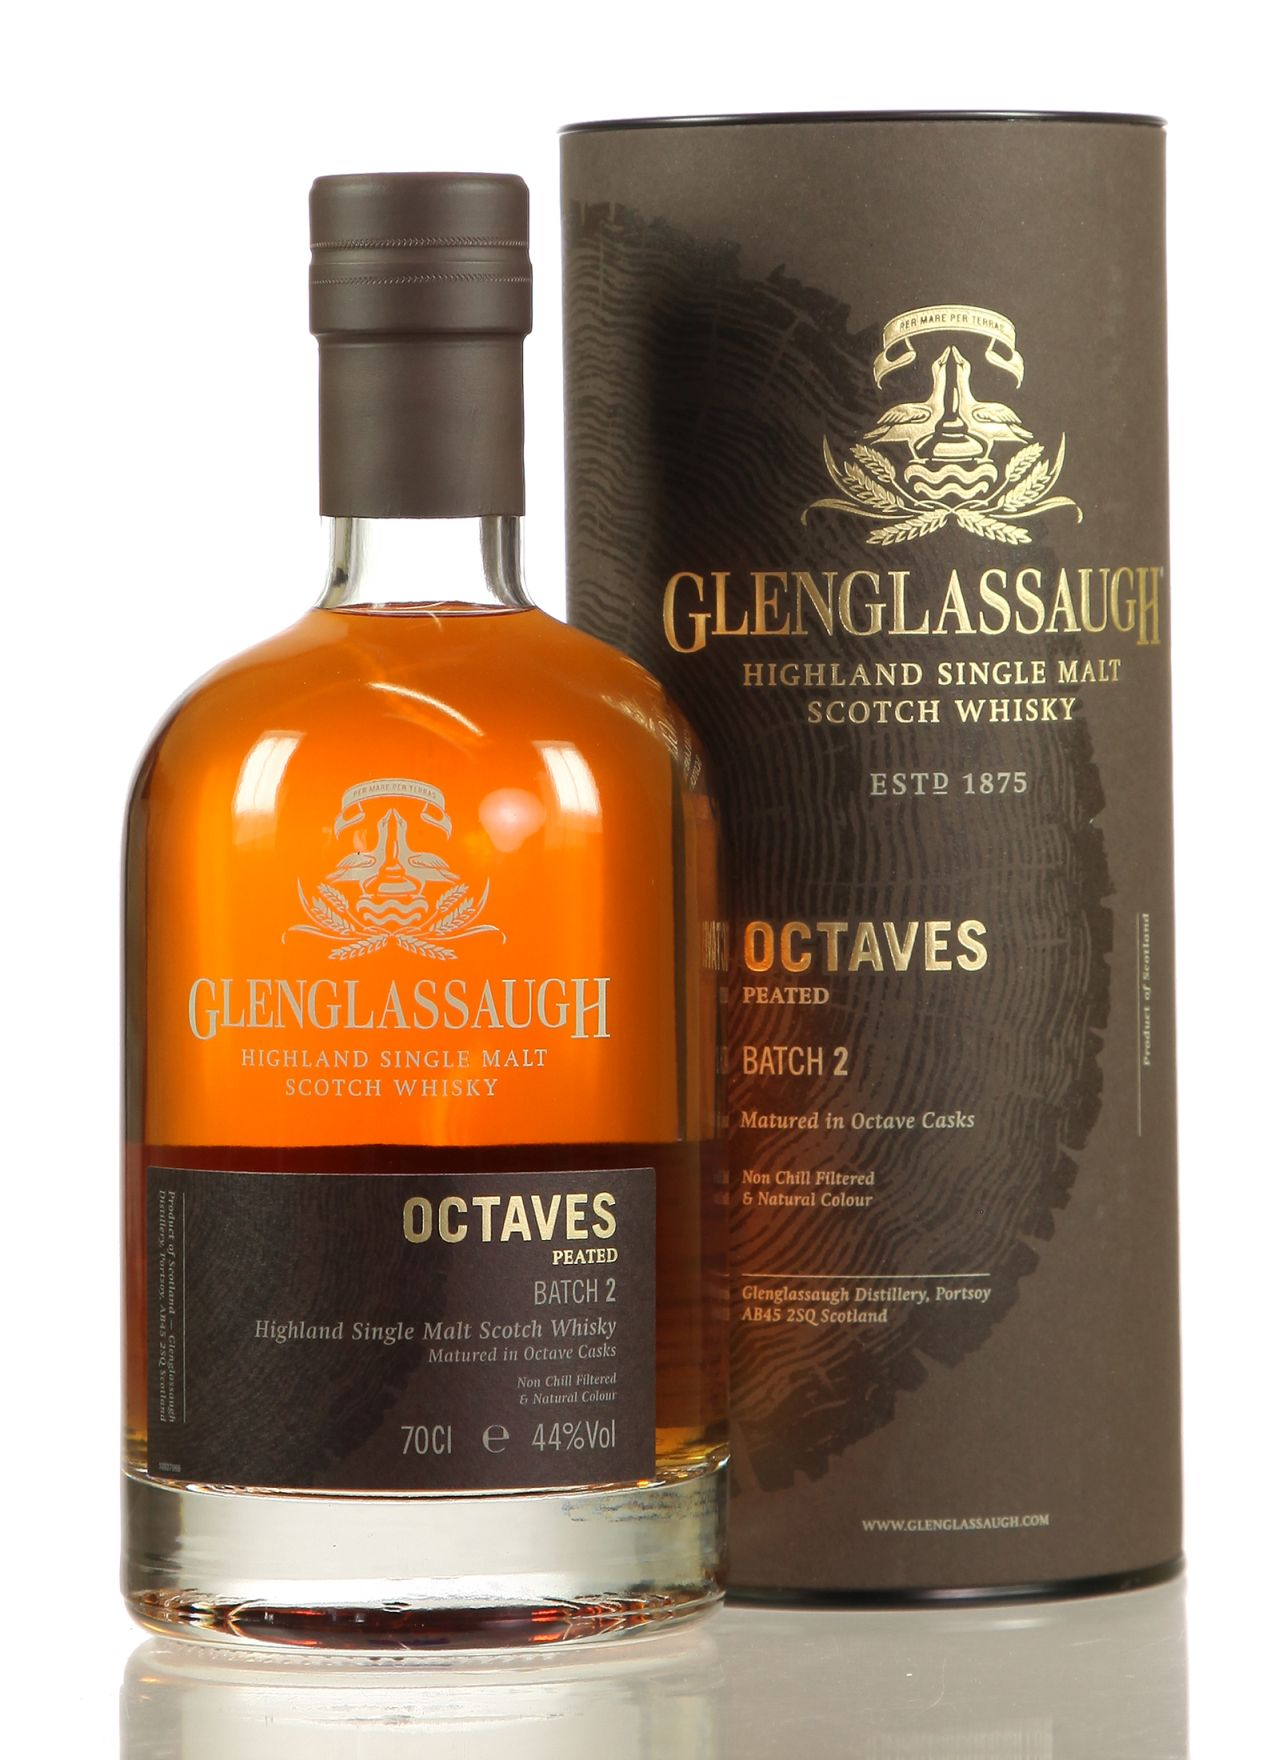 Glenglassaugh Octaves Peated - Batch No. 2